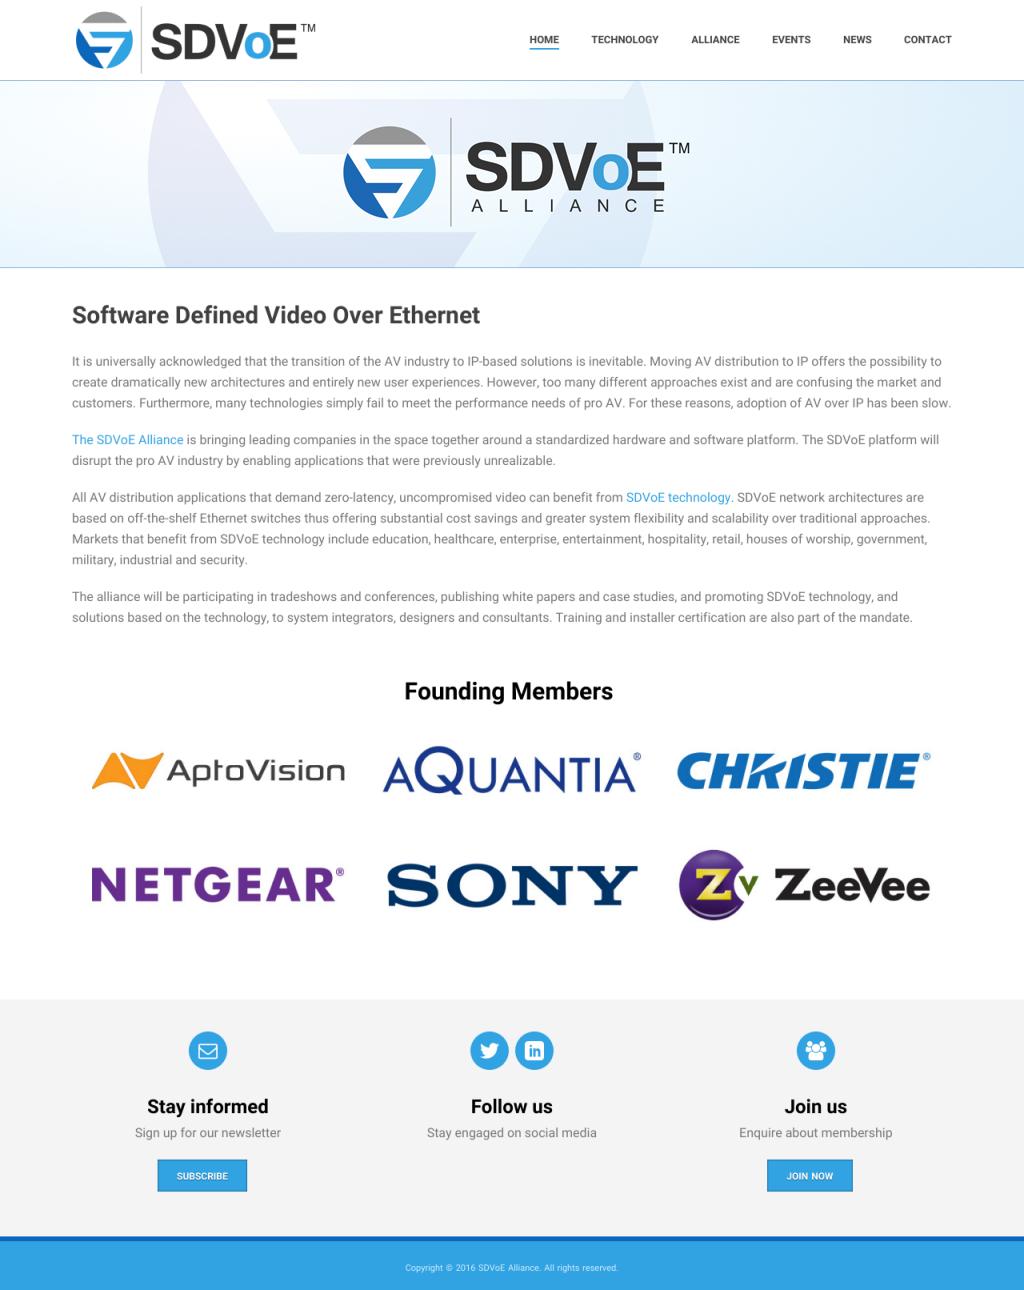 SDVoE Website